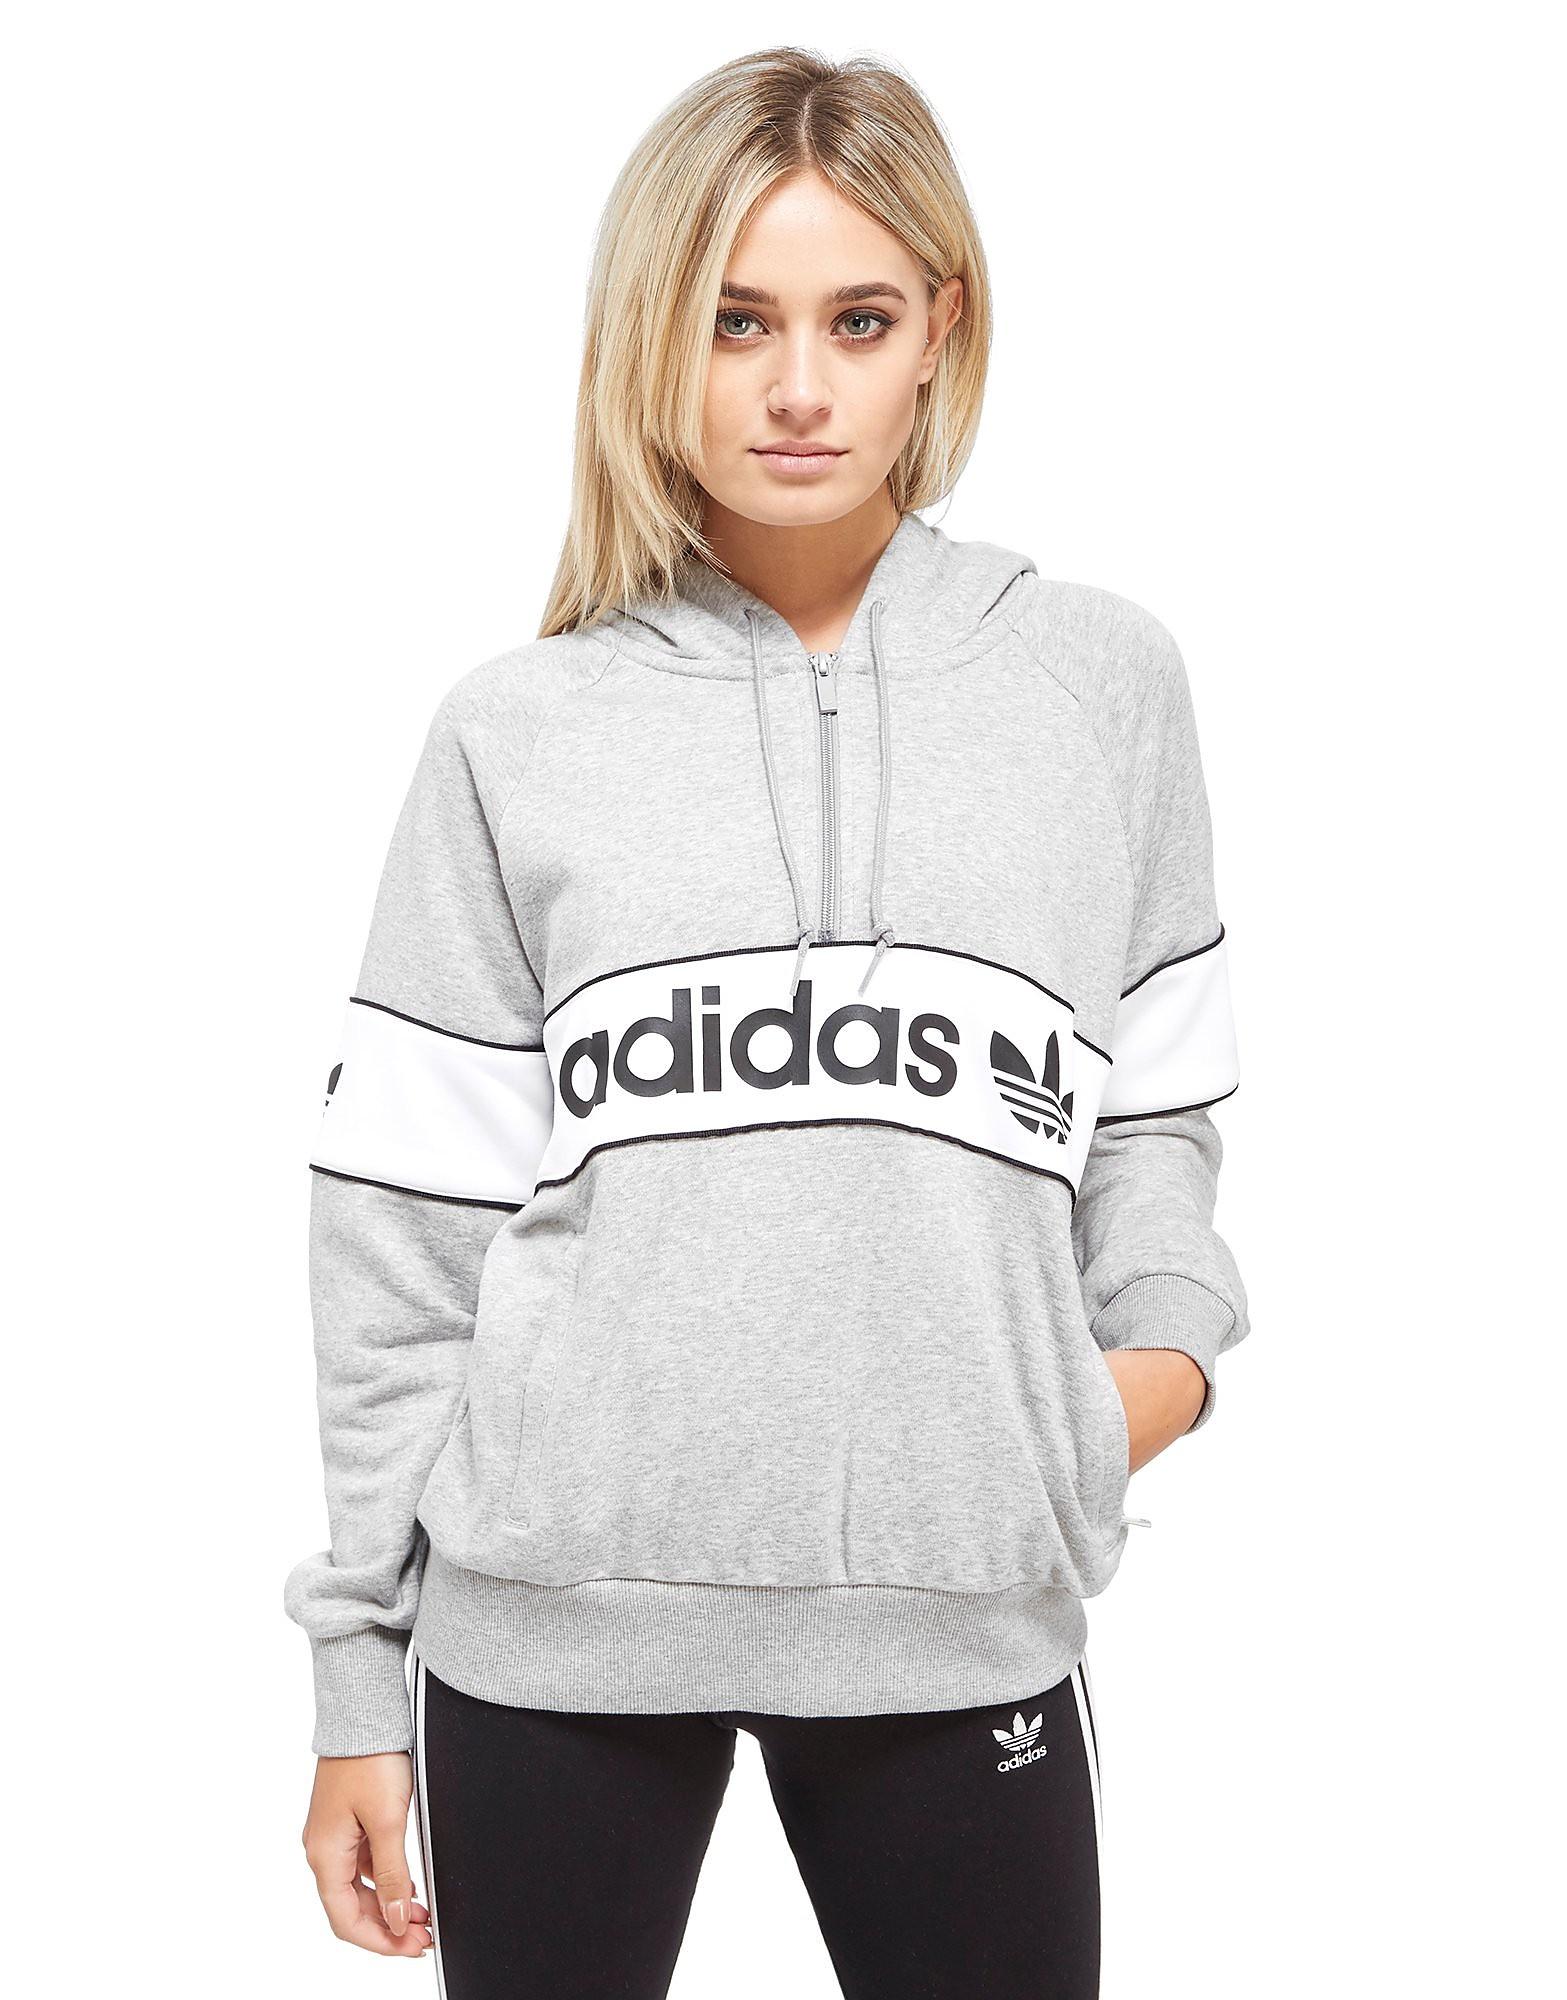 adidas Originals Authentic Half Zip Hoodie